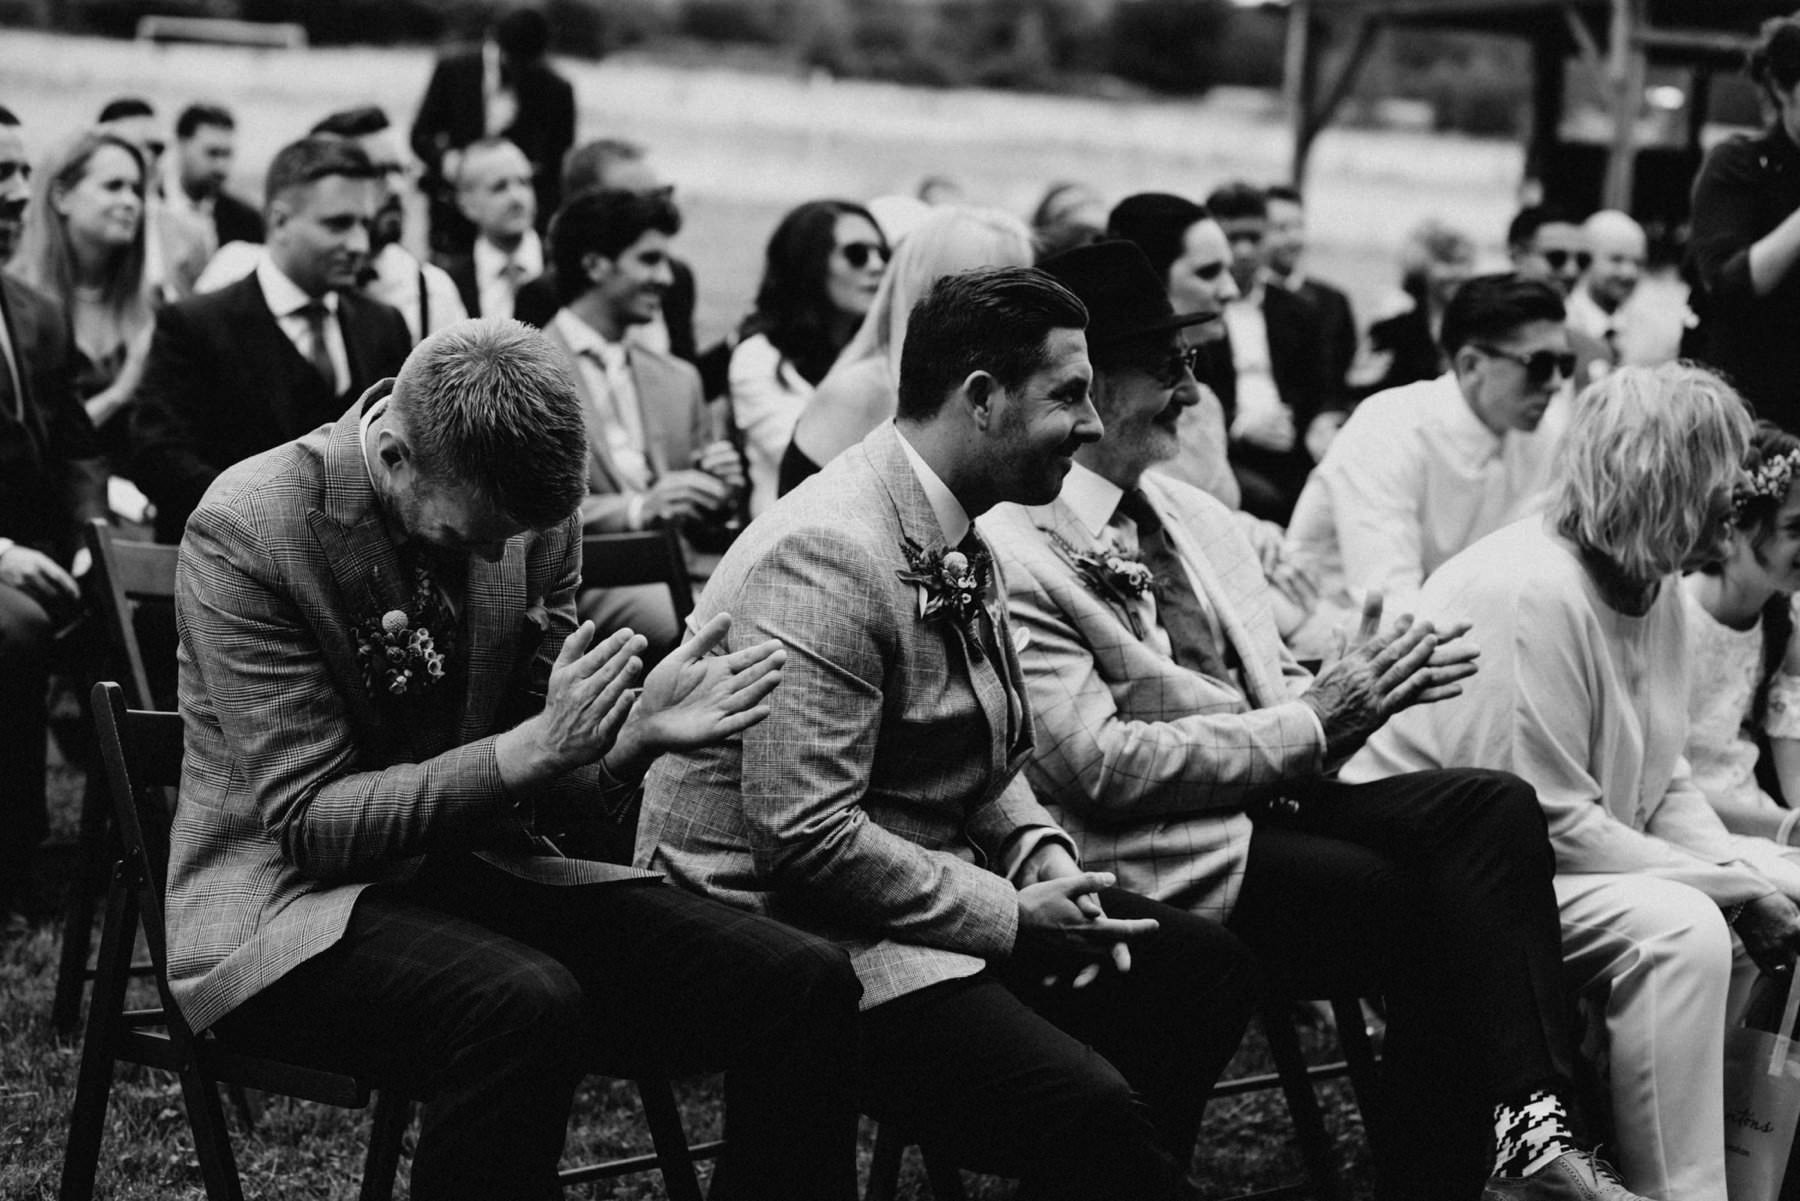 wedding photo norwich